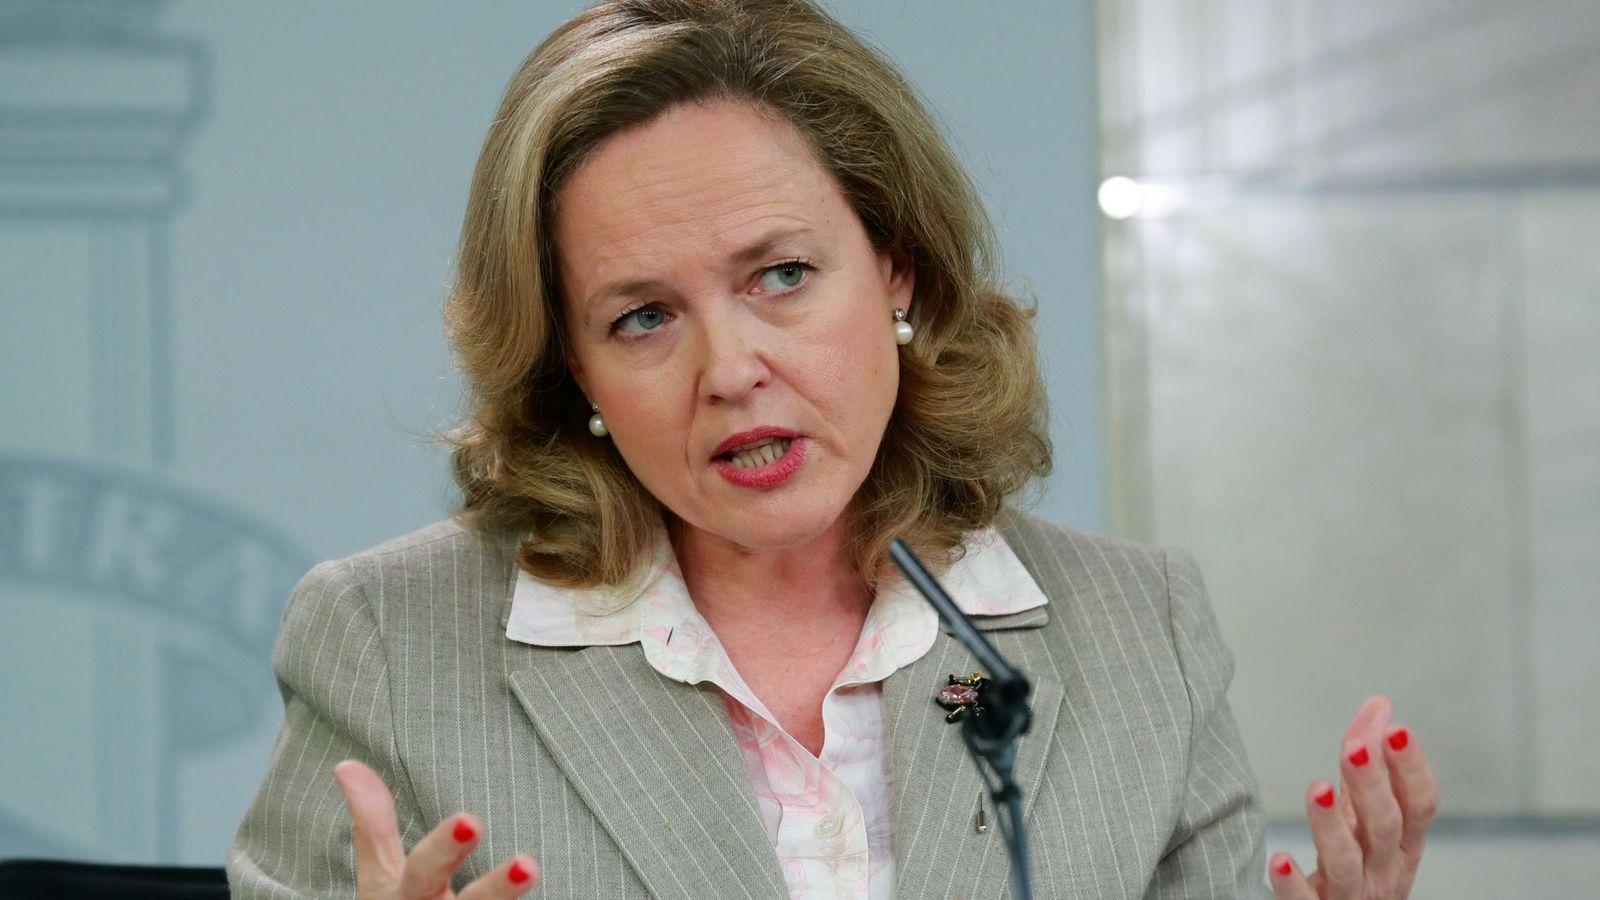 Foto: La ministra de Economía, Nadia Calviño, en La Moncloa. (EFE)